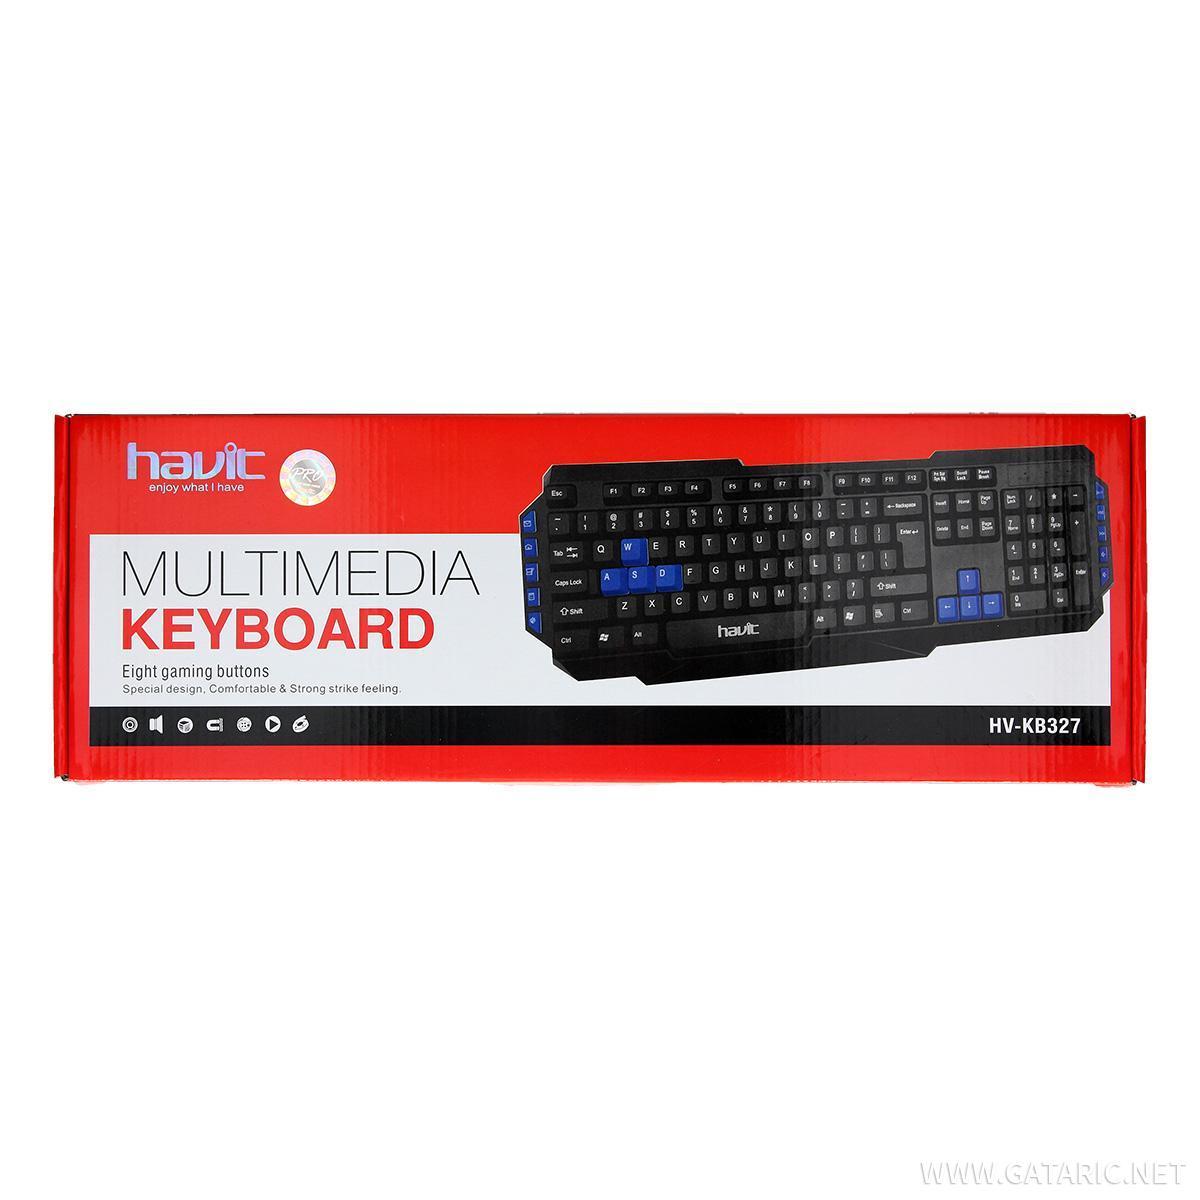 0b54e501c82 USB tastatura Multi-media ''HV-KB327'' 6950676209297 | Gataric Group